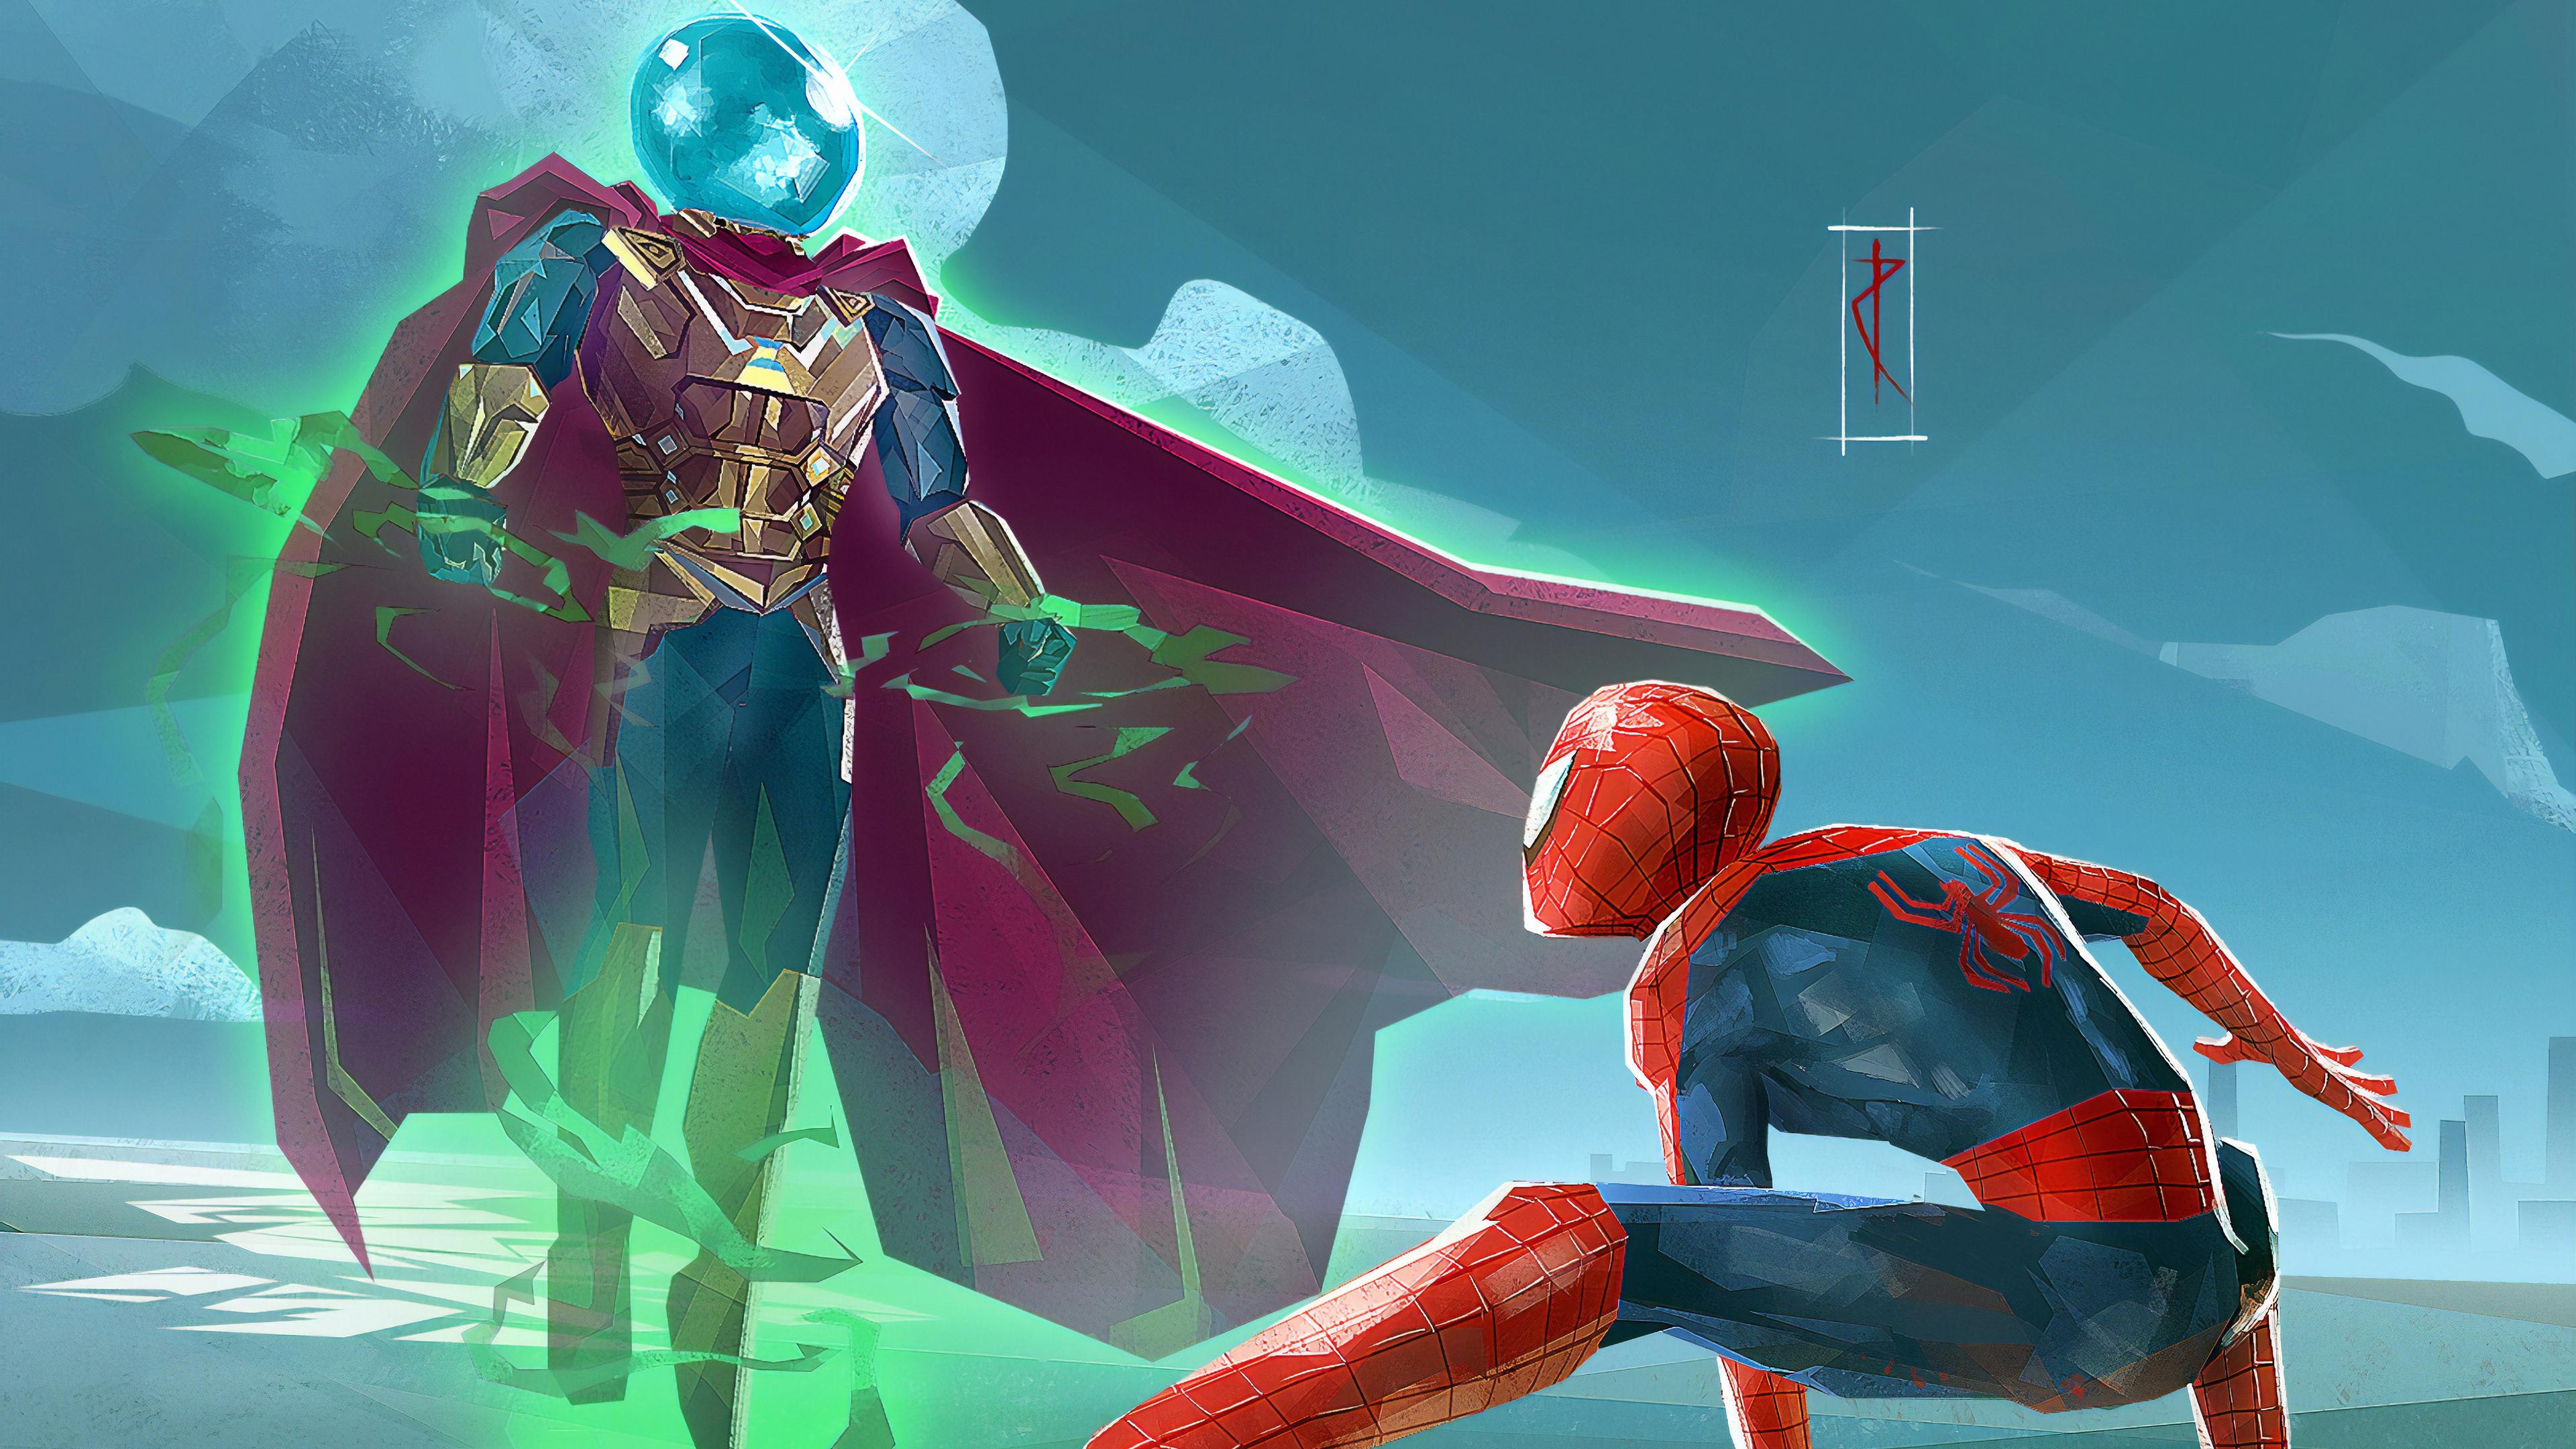 spiderman vs mysterio art 1565053621 - Spiderman Vs Mysterio Art - superheroes wallpapers, spiderman wallpapers, mysterio wallpapers, hd-wallpapers, digital art wallpapers, artwork wallpapers, artstation wallpapers